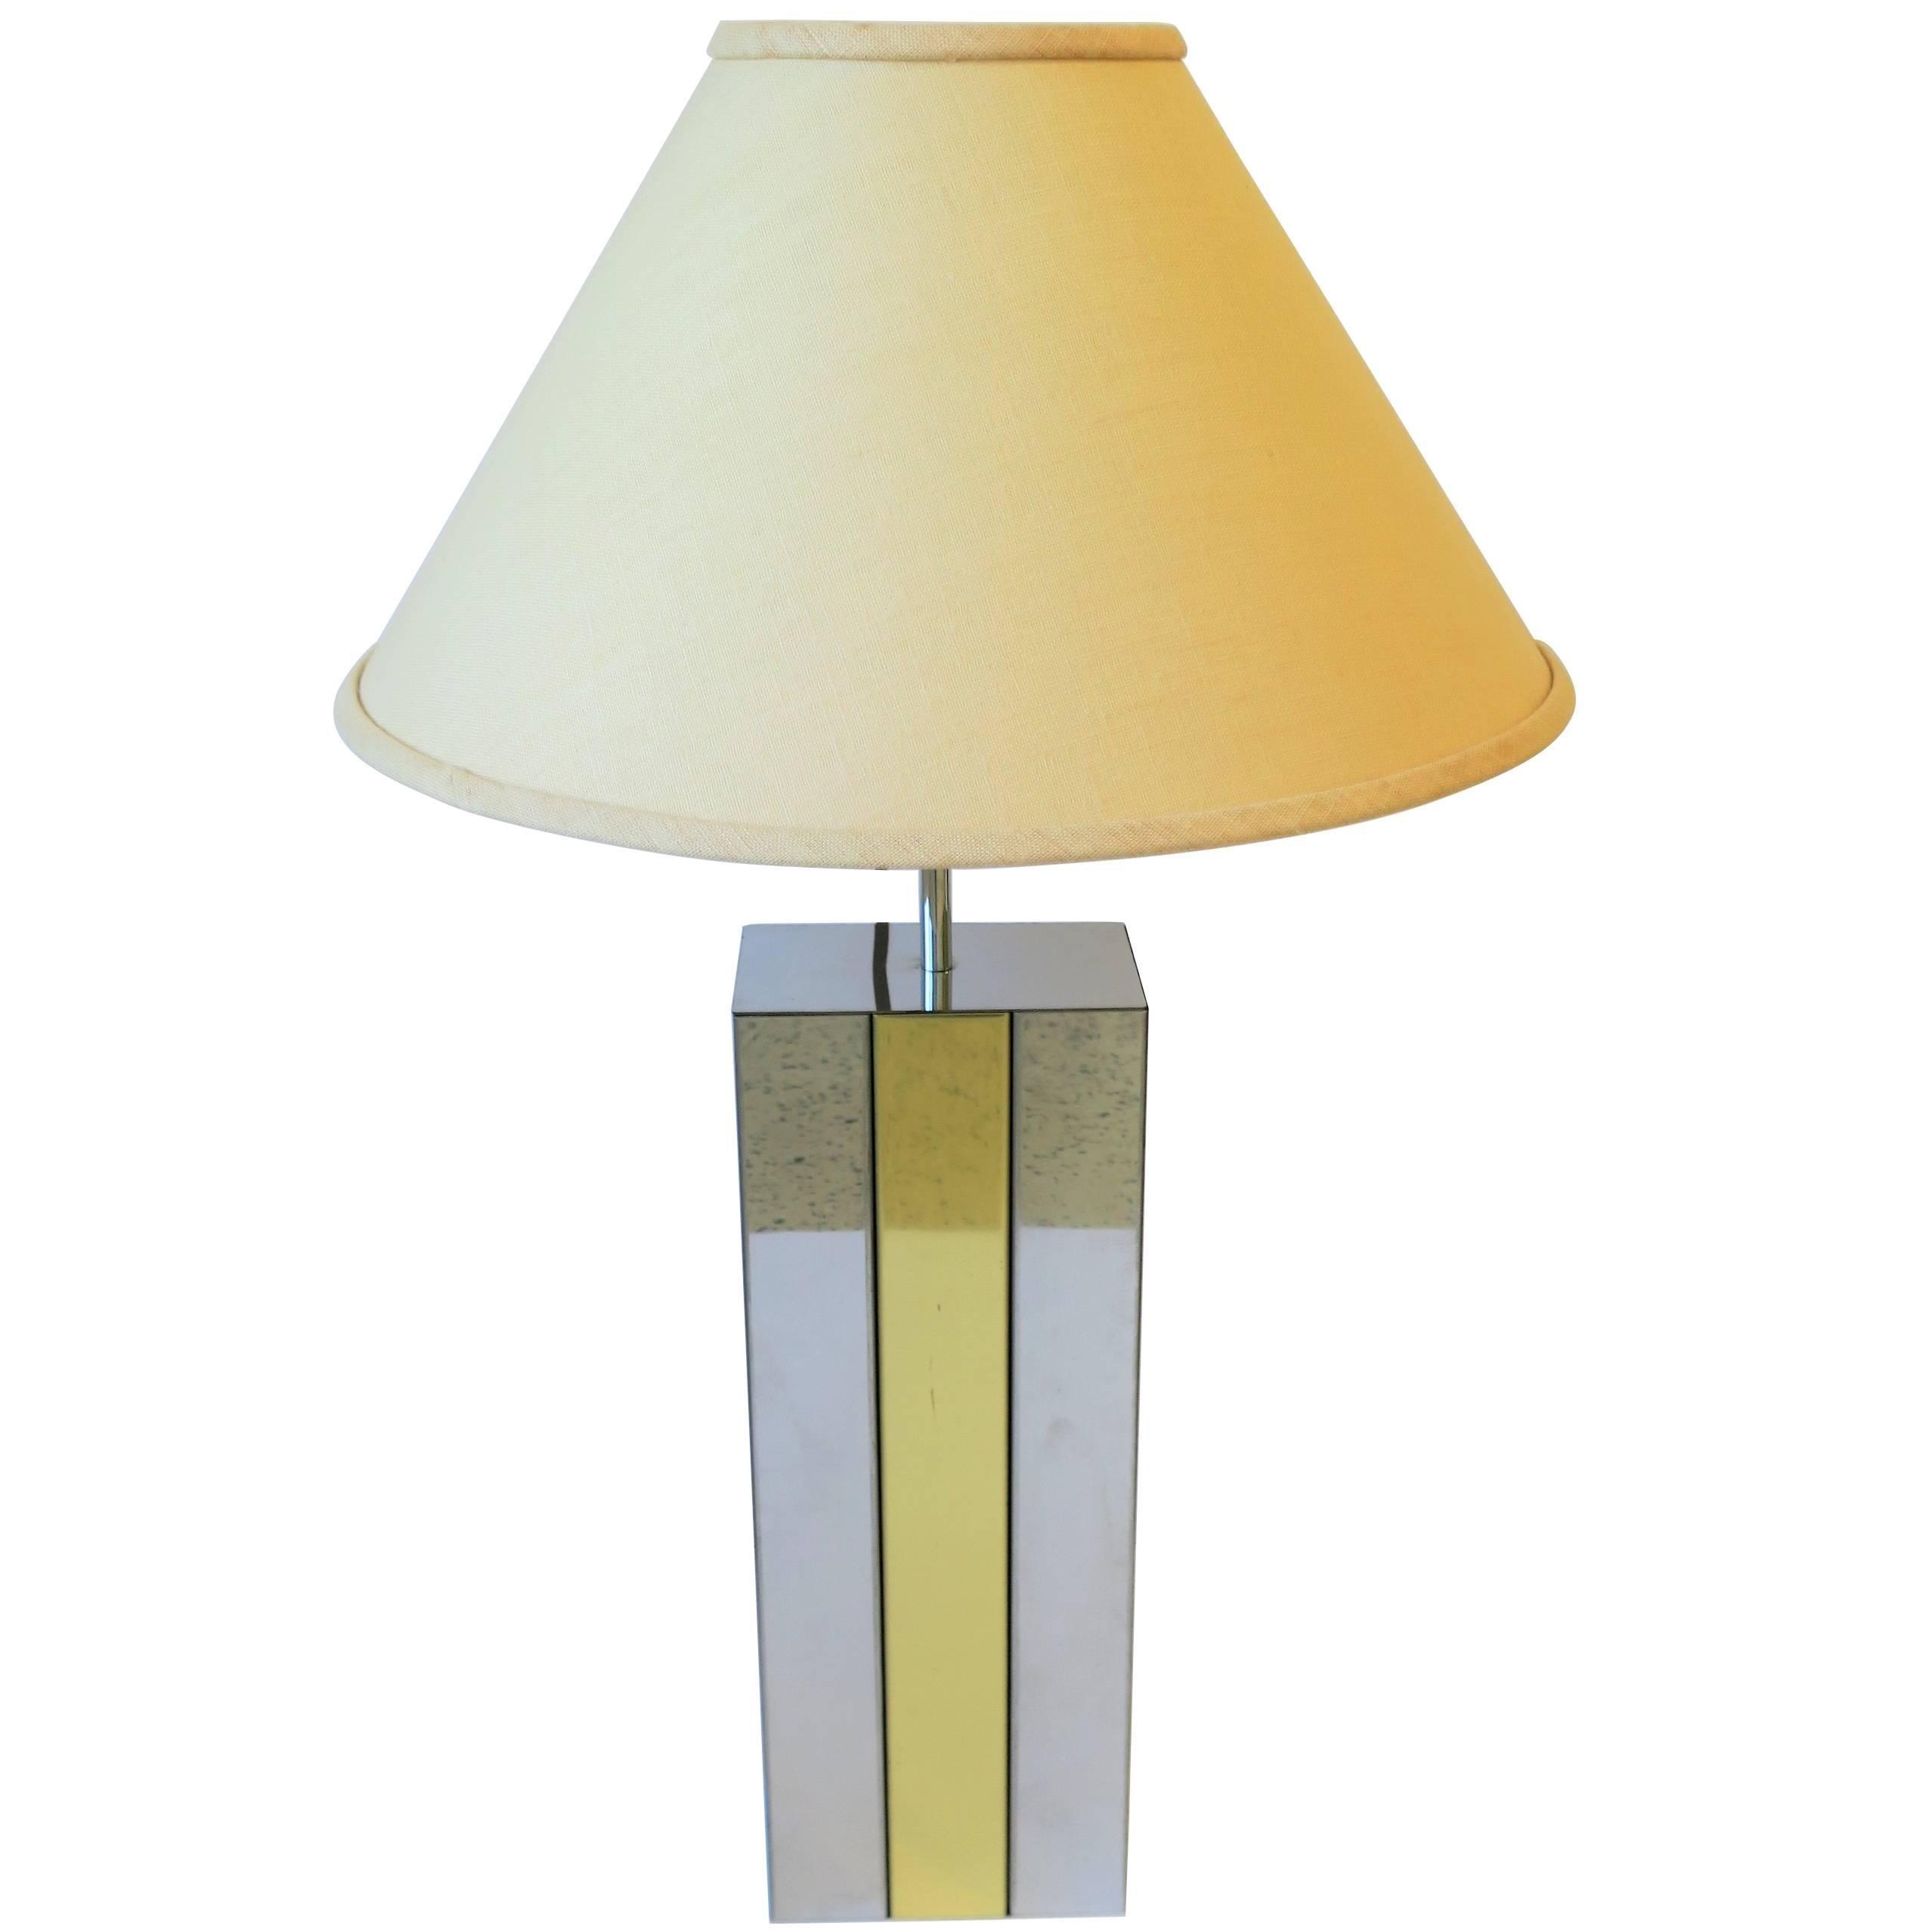 Modern Robert Sonneman Chrome and Brass Table Lamp, ca. 1970s